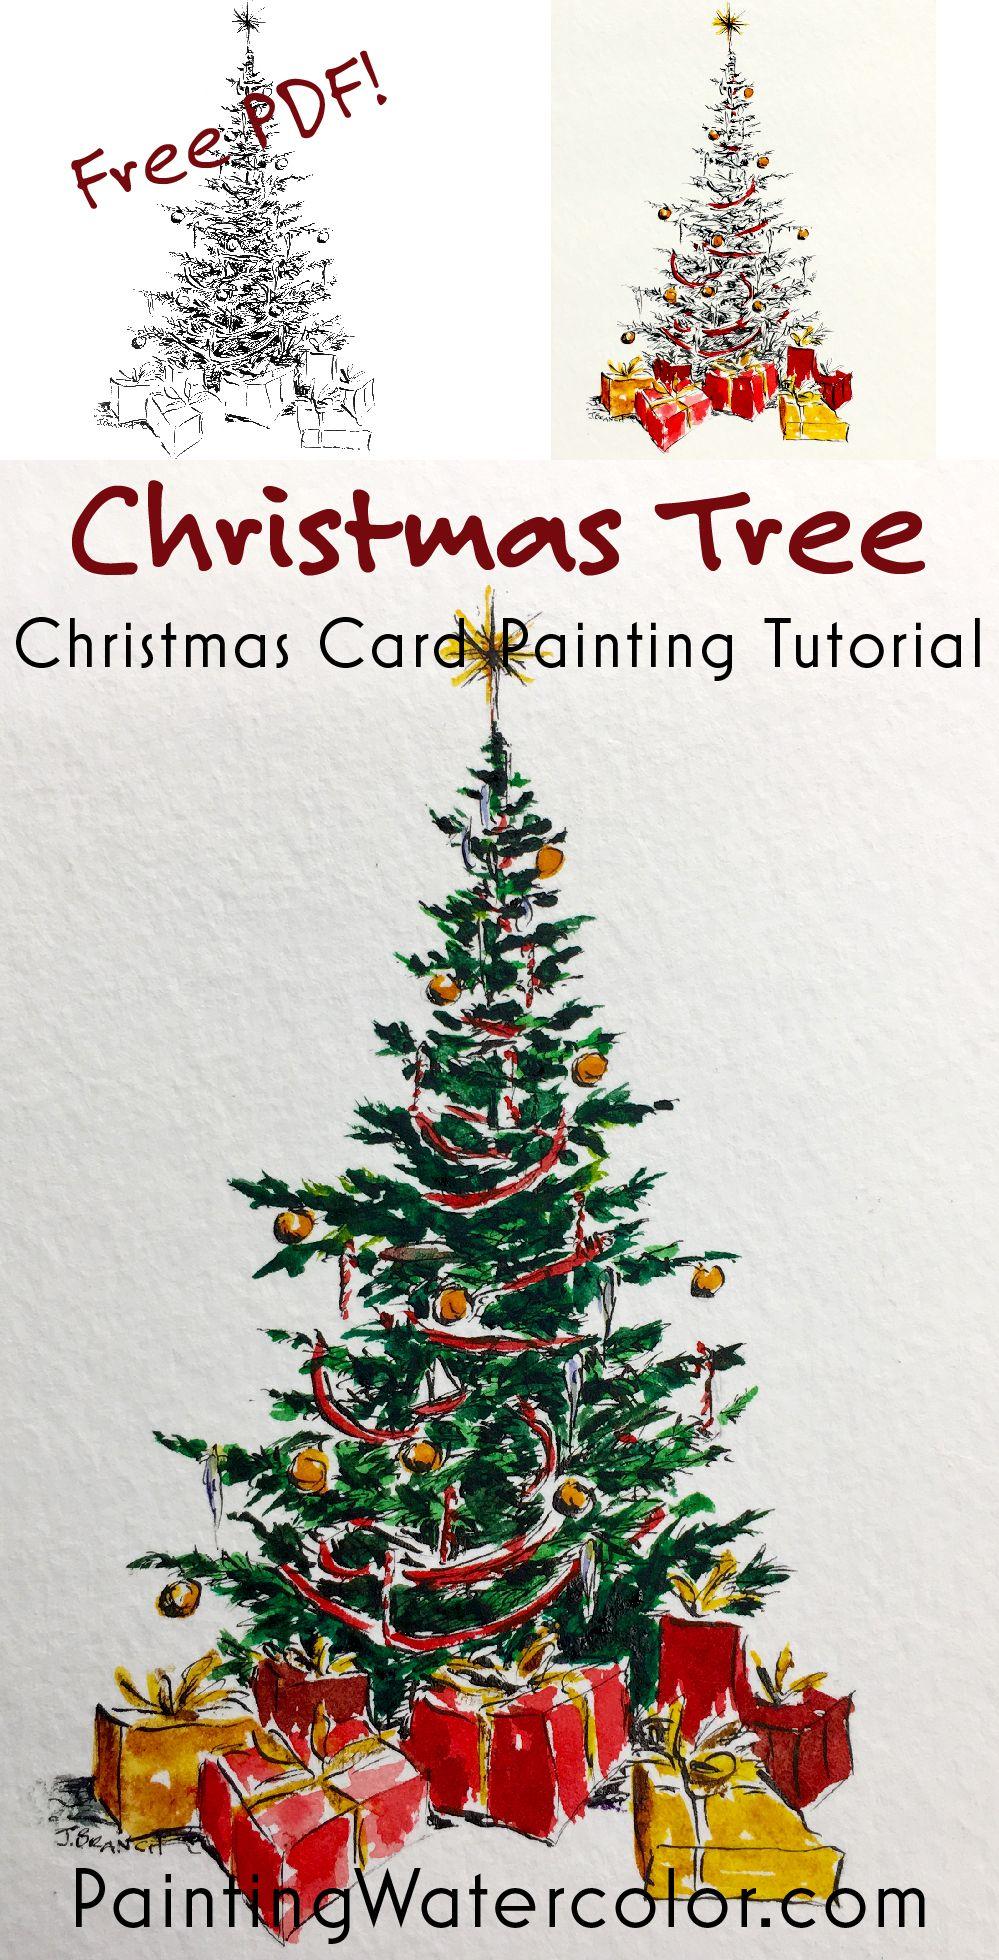 Paint A Beautiful Christmas Tree For Your Christmas Cards Free Printable Pdf And Y Christmas Tree Drawing Watercolor Christmas Cards Watercolor Christmas Tree